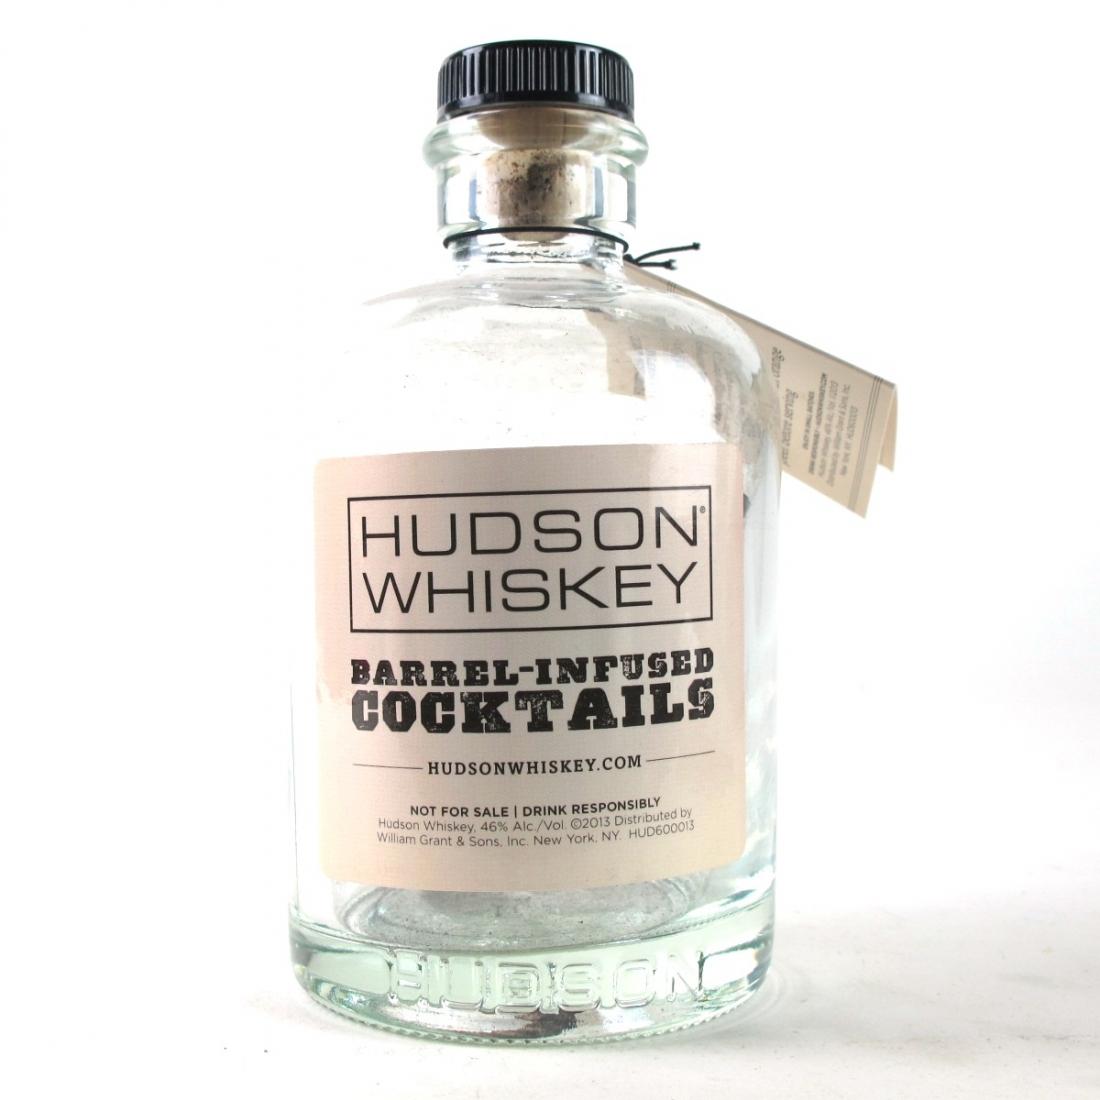 Hudson Whiskey Set in Wooden Presentation Crate